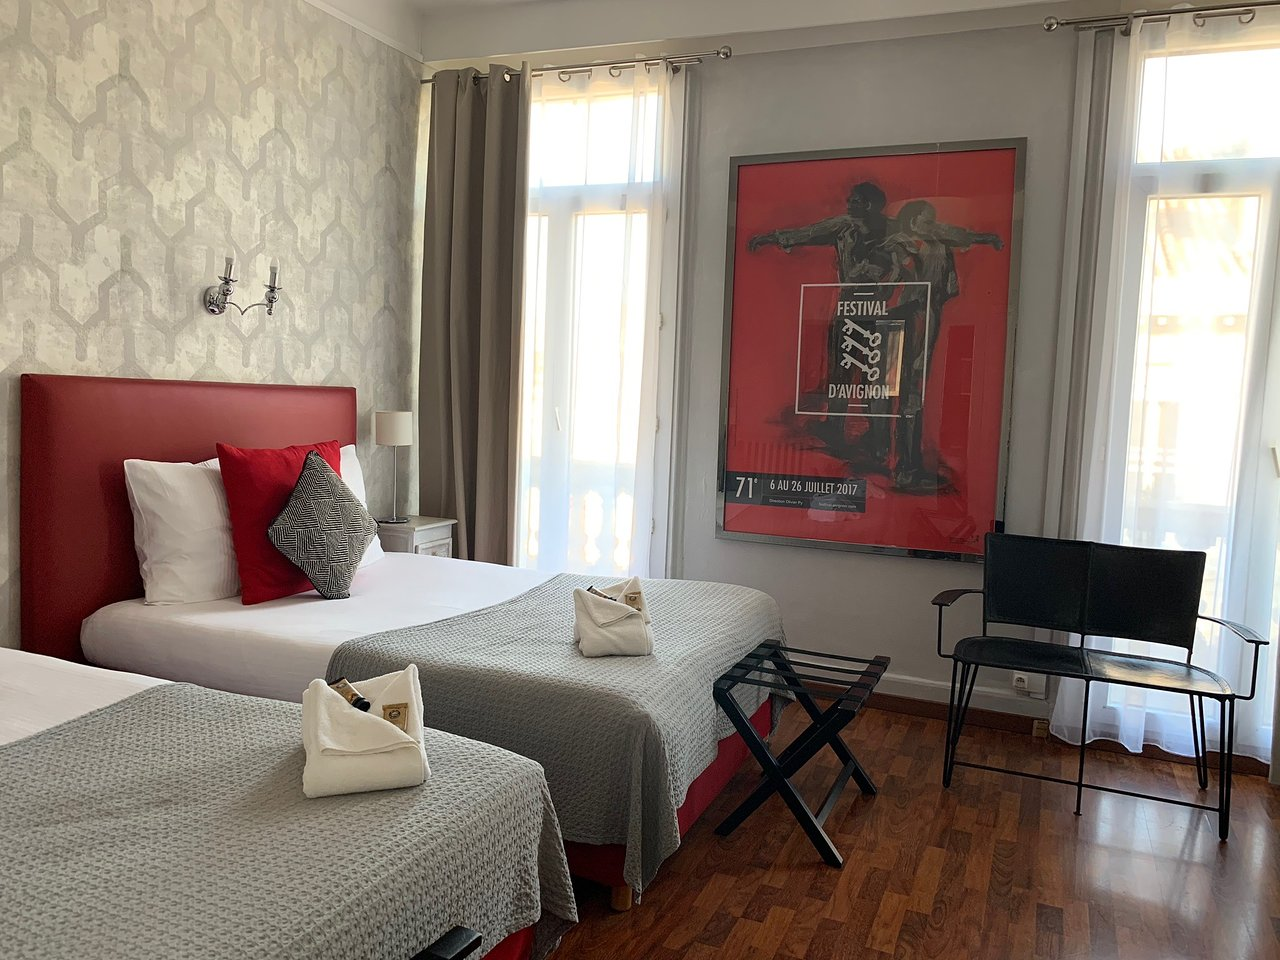 Beatrice D Avignon Avis regina hotel $53 ($̶7̶6̶) - updated 2020 prices & reviews